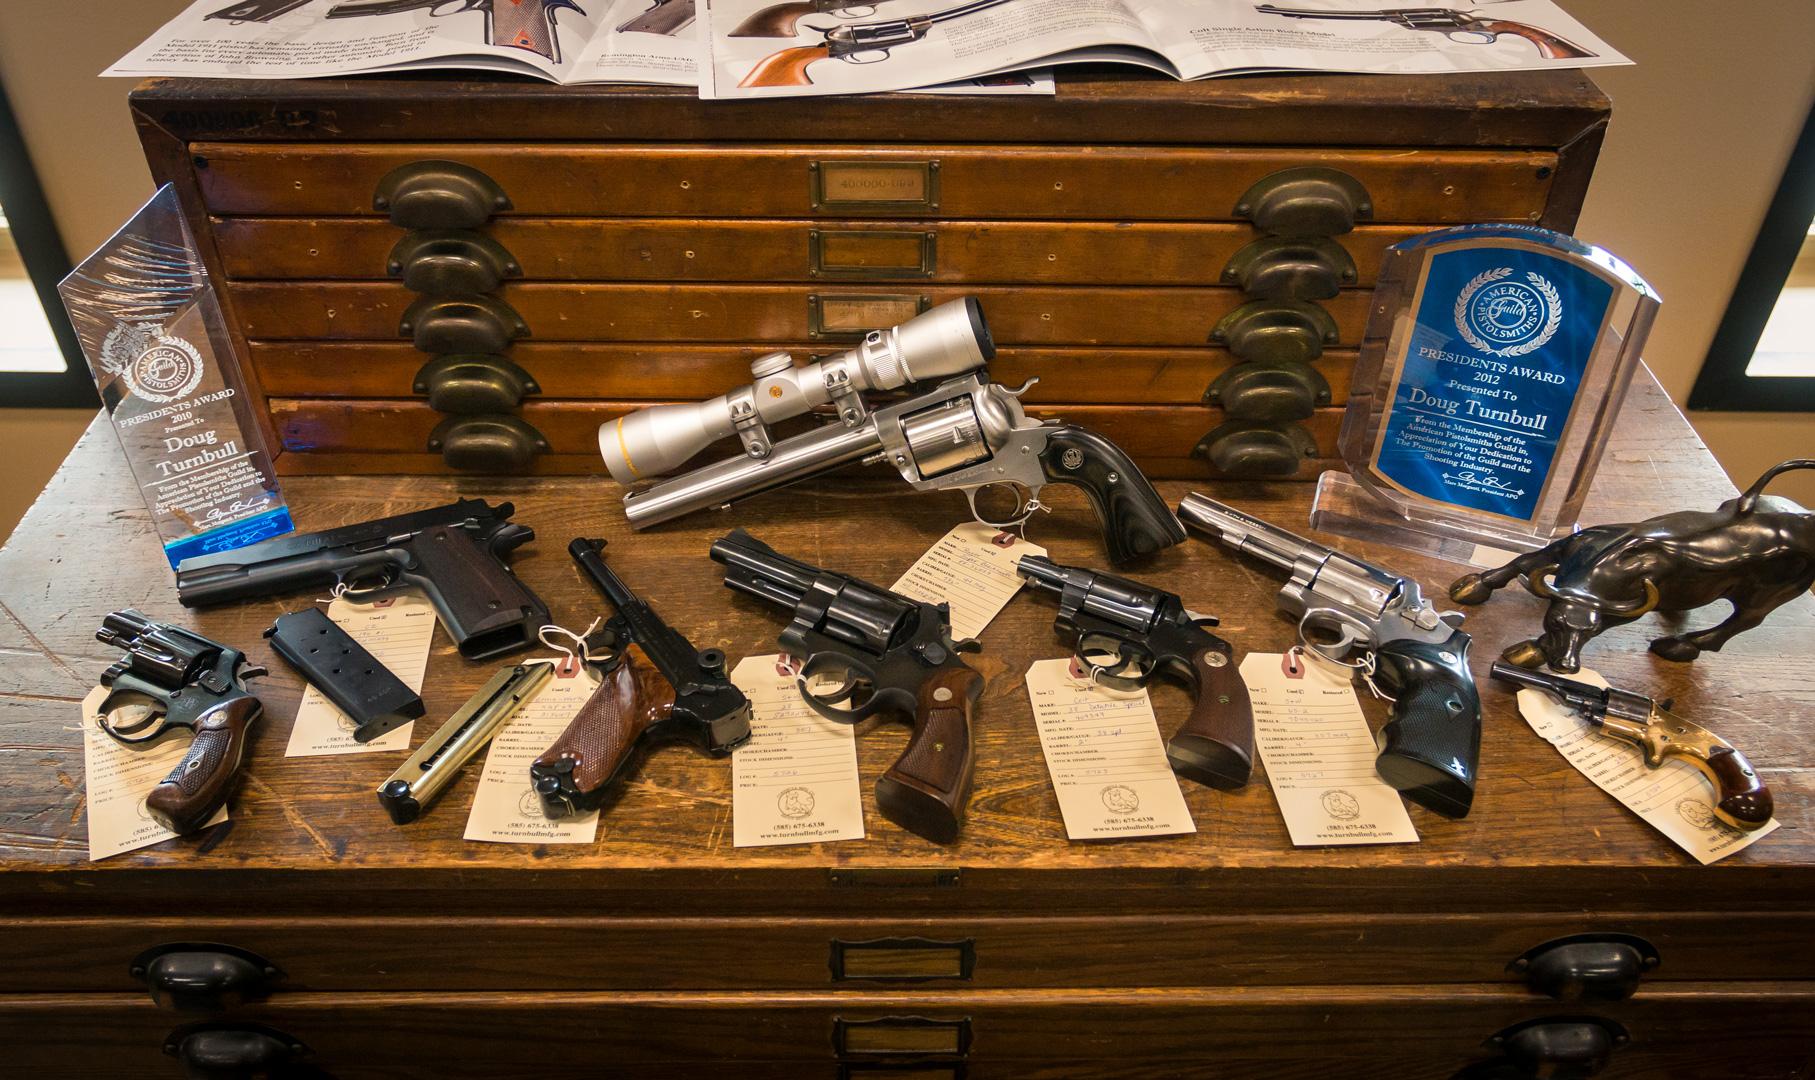 Handgun collection brought in through Turnbull trade-in program